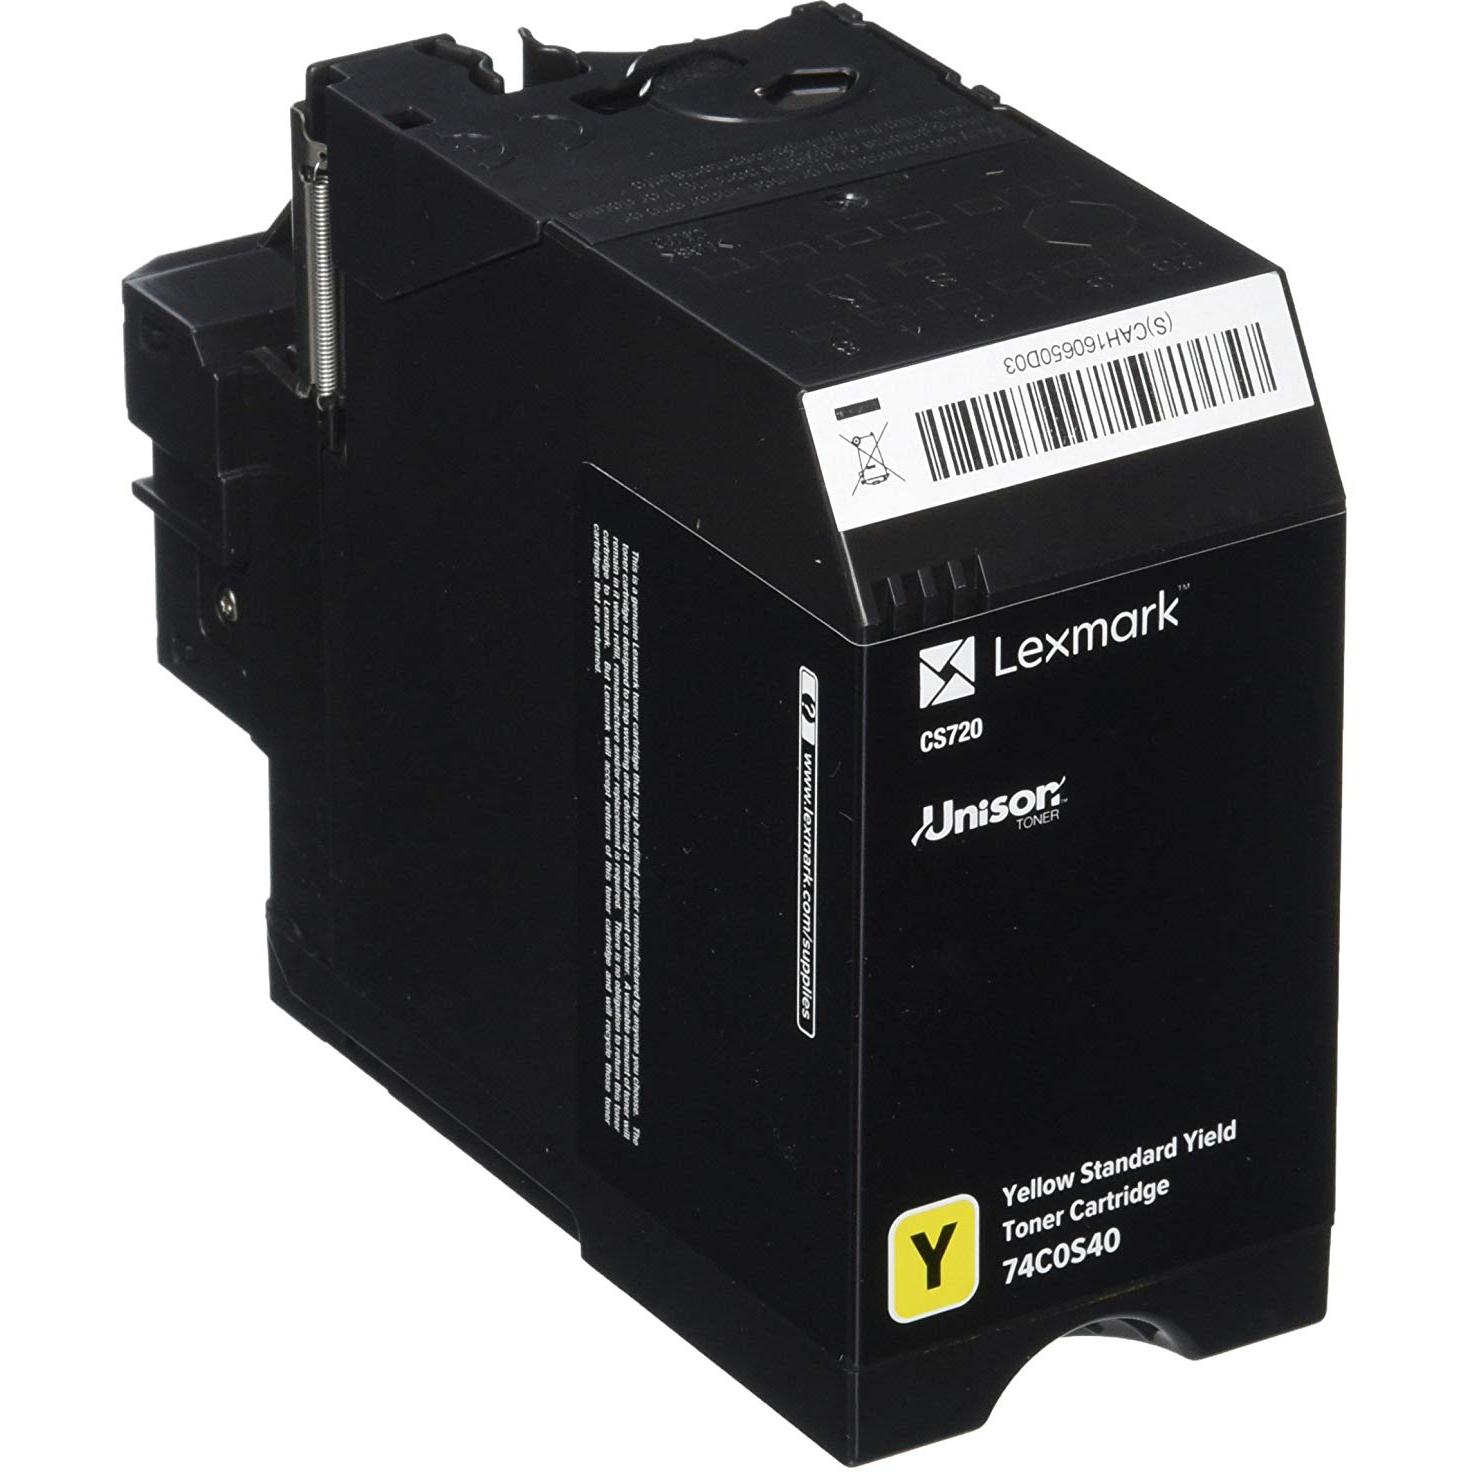 Original Lexmark Cs720 Yellow Standard Yield Toner Ca (74C0S40)